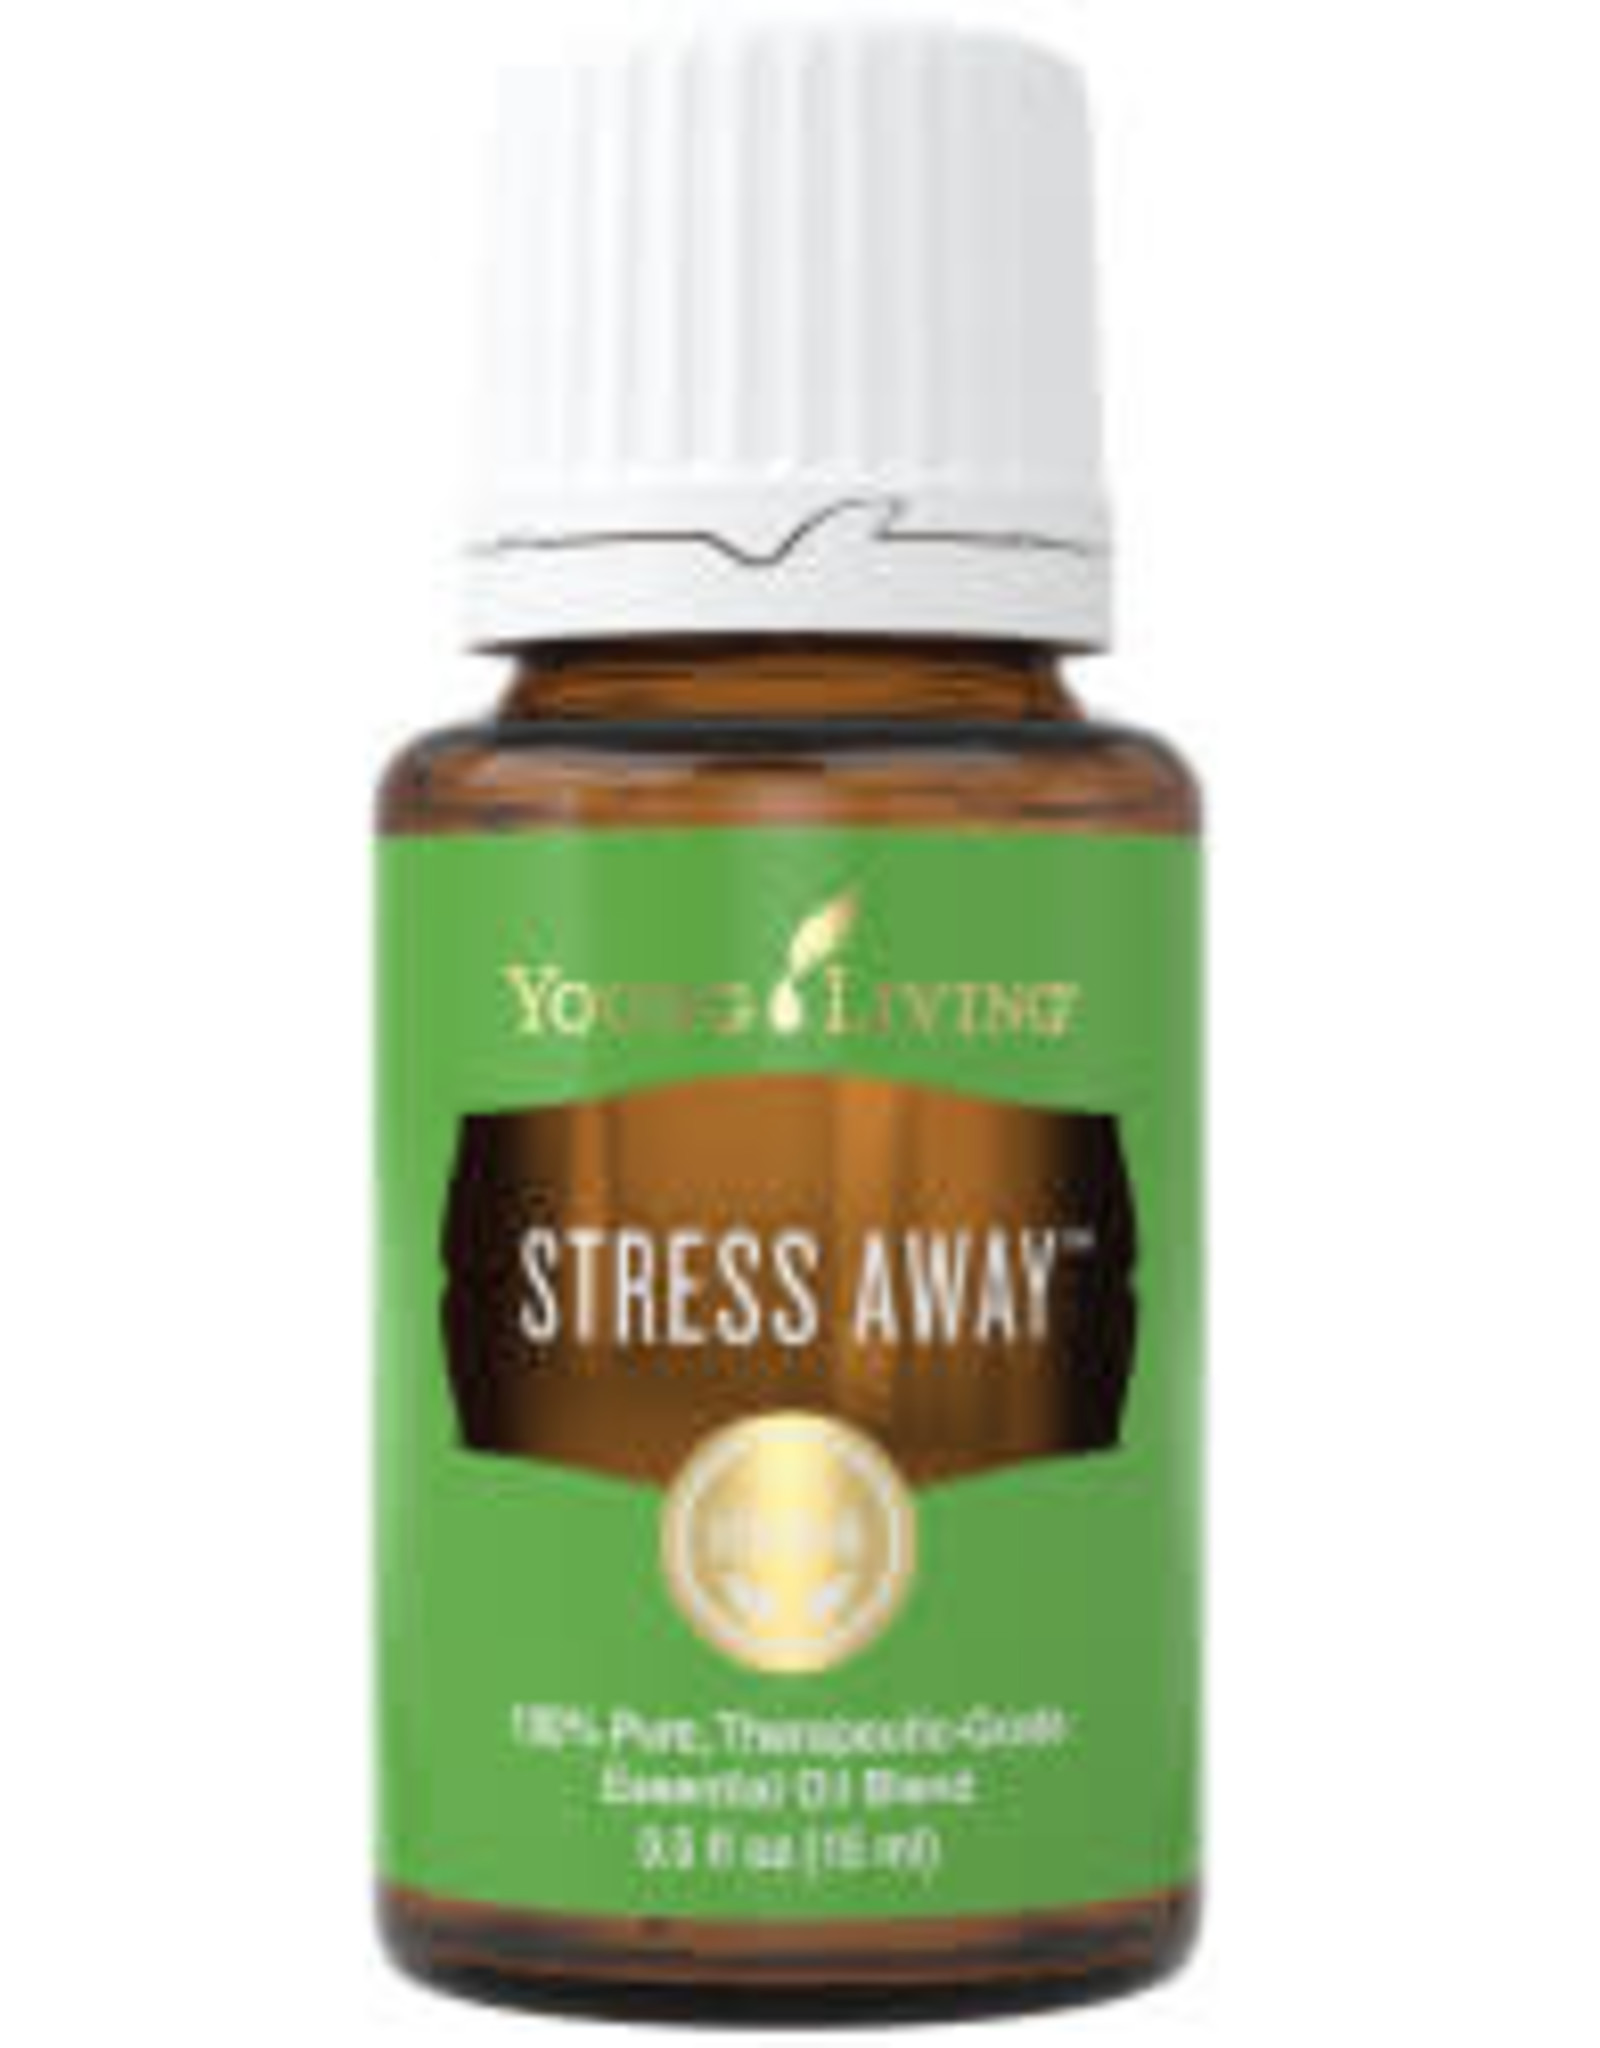 Young Living Stress Away Oil Blend